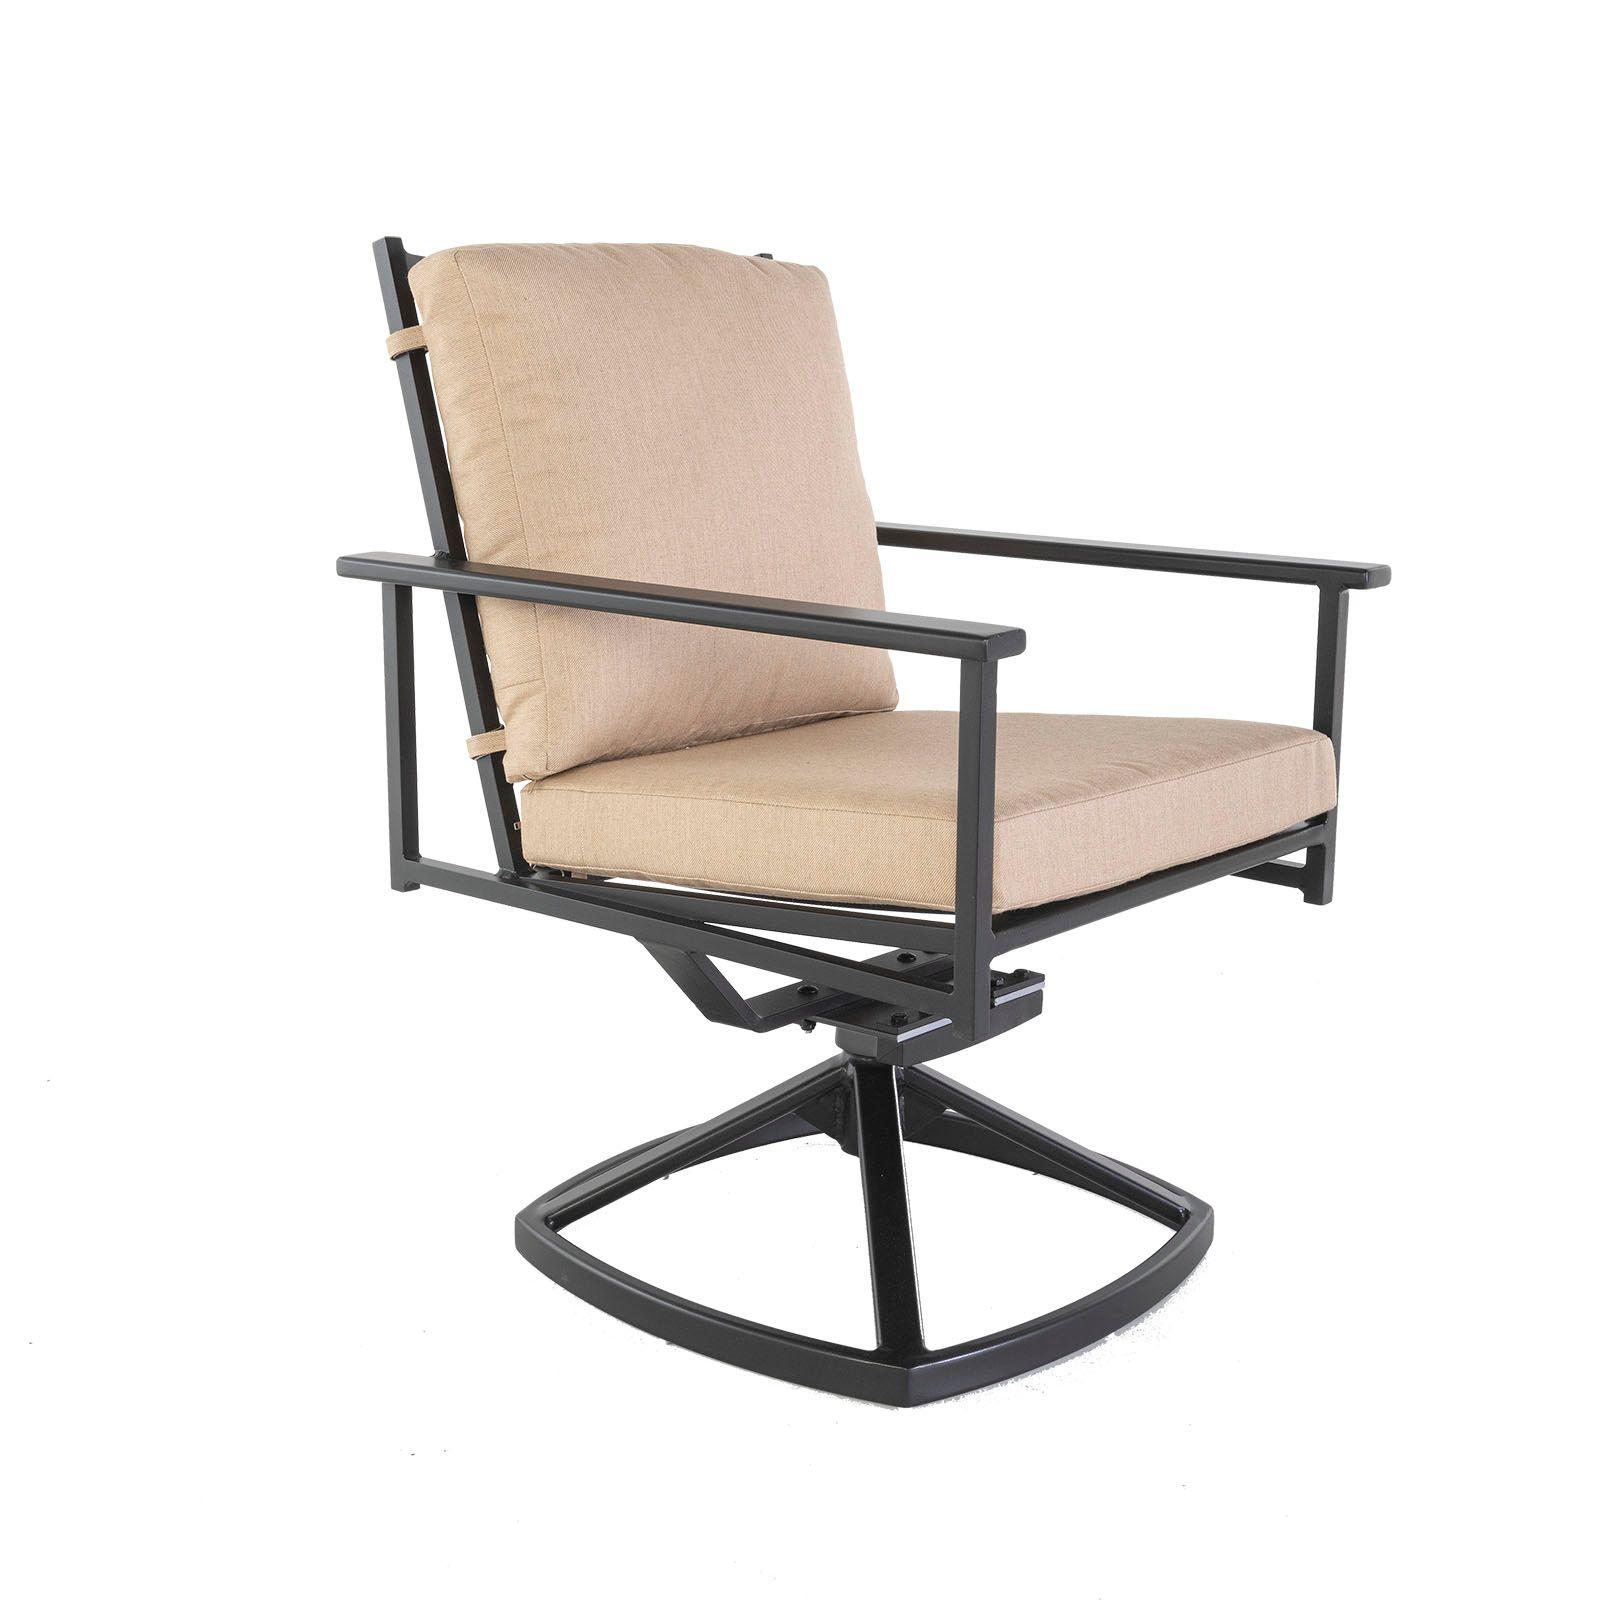 Kensington Swivel Rocker Dining Arm Chair